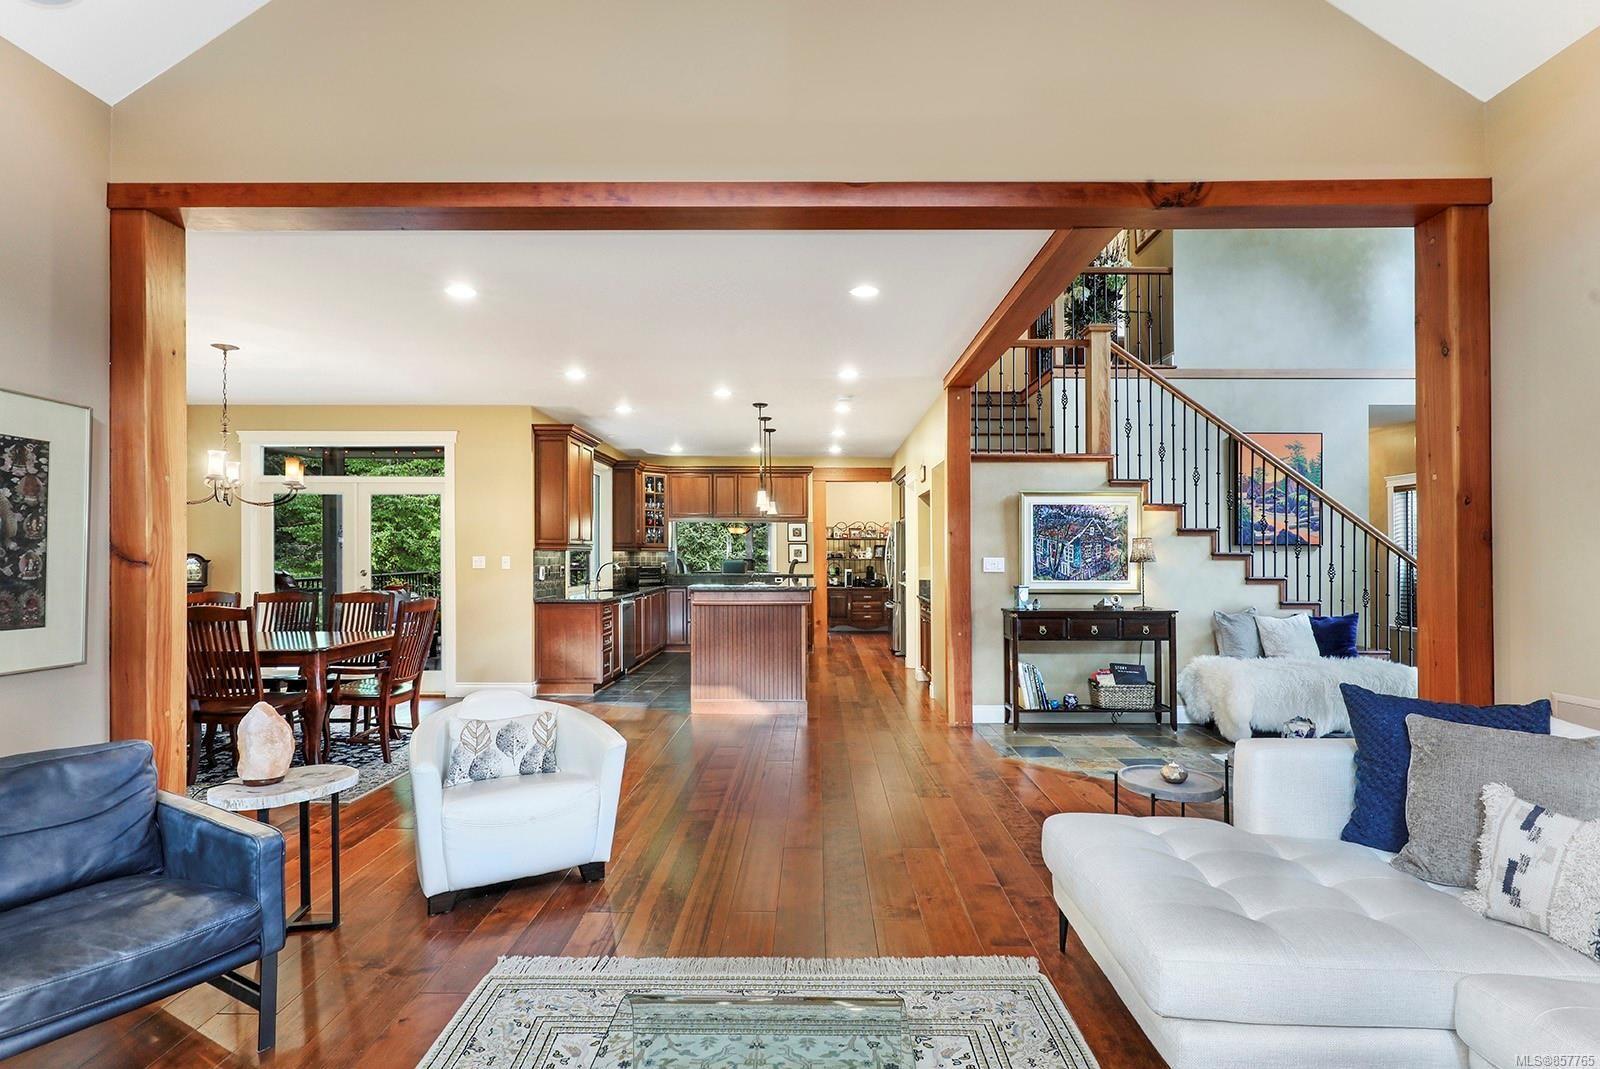 Photo 11: Photos: 1516 Highridge Dr in : CV Comox (Town of) House for sale (Comox Valley)  : MLS®# 857765